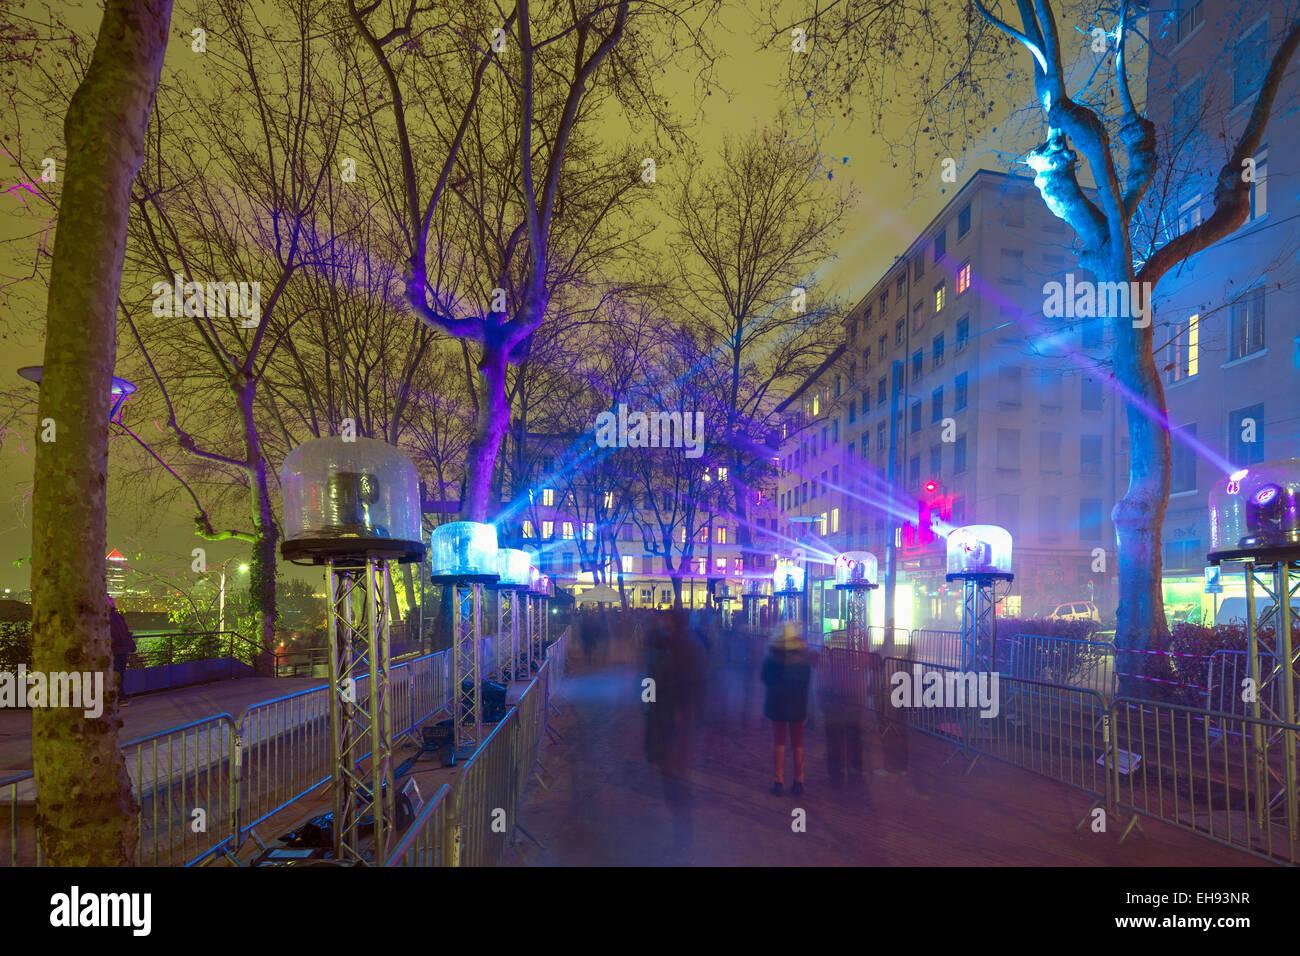 Europe, France, Rhone-Alpes, Lyon, Fete des Lumieres, festival of lights, illuminated park - Stock Image